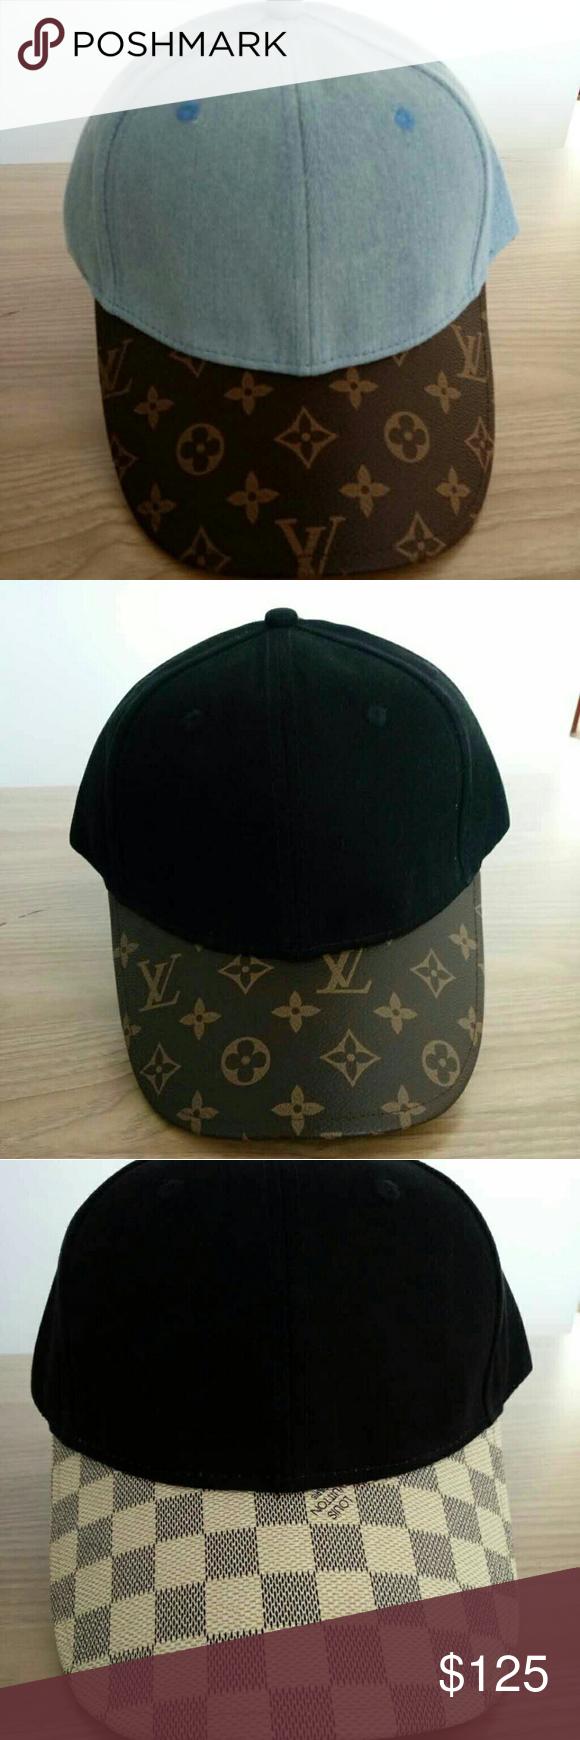 Custom Louis Vuitton Dad Hats Custom Louis Vuitton Dad Hats Made from  authentic Louis Vuitton on c103237e98b